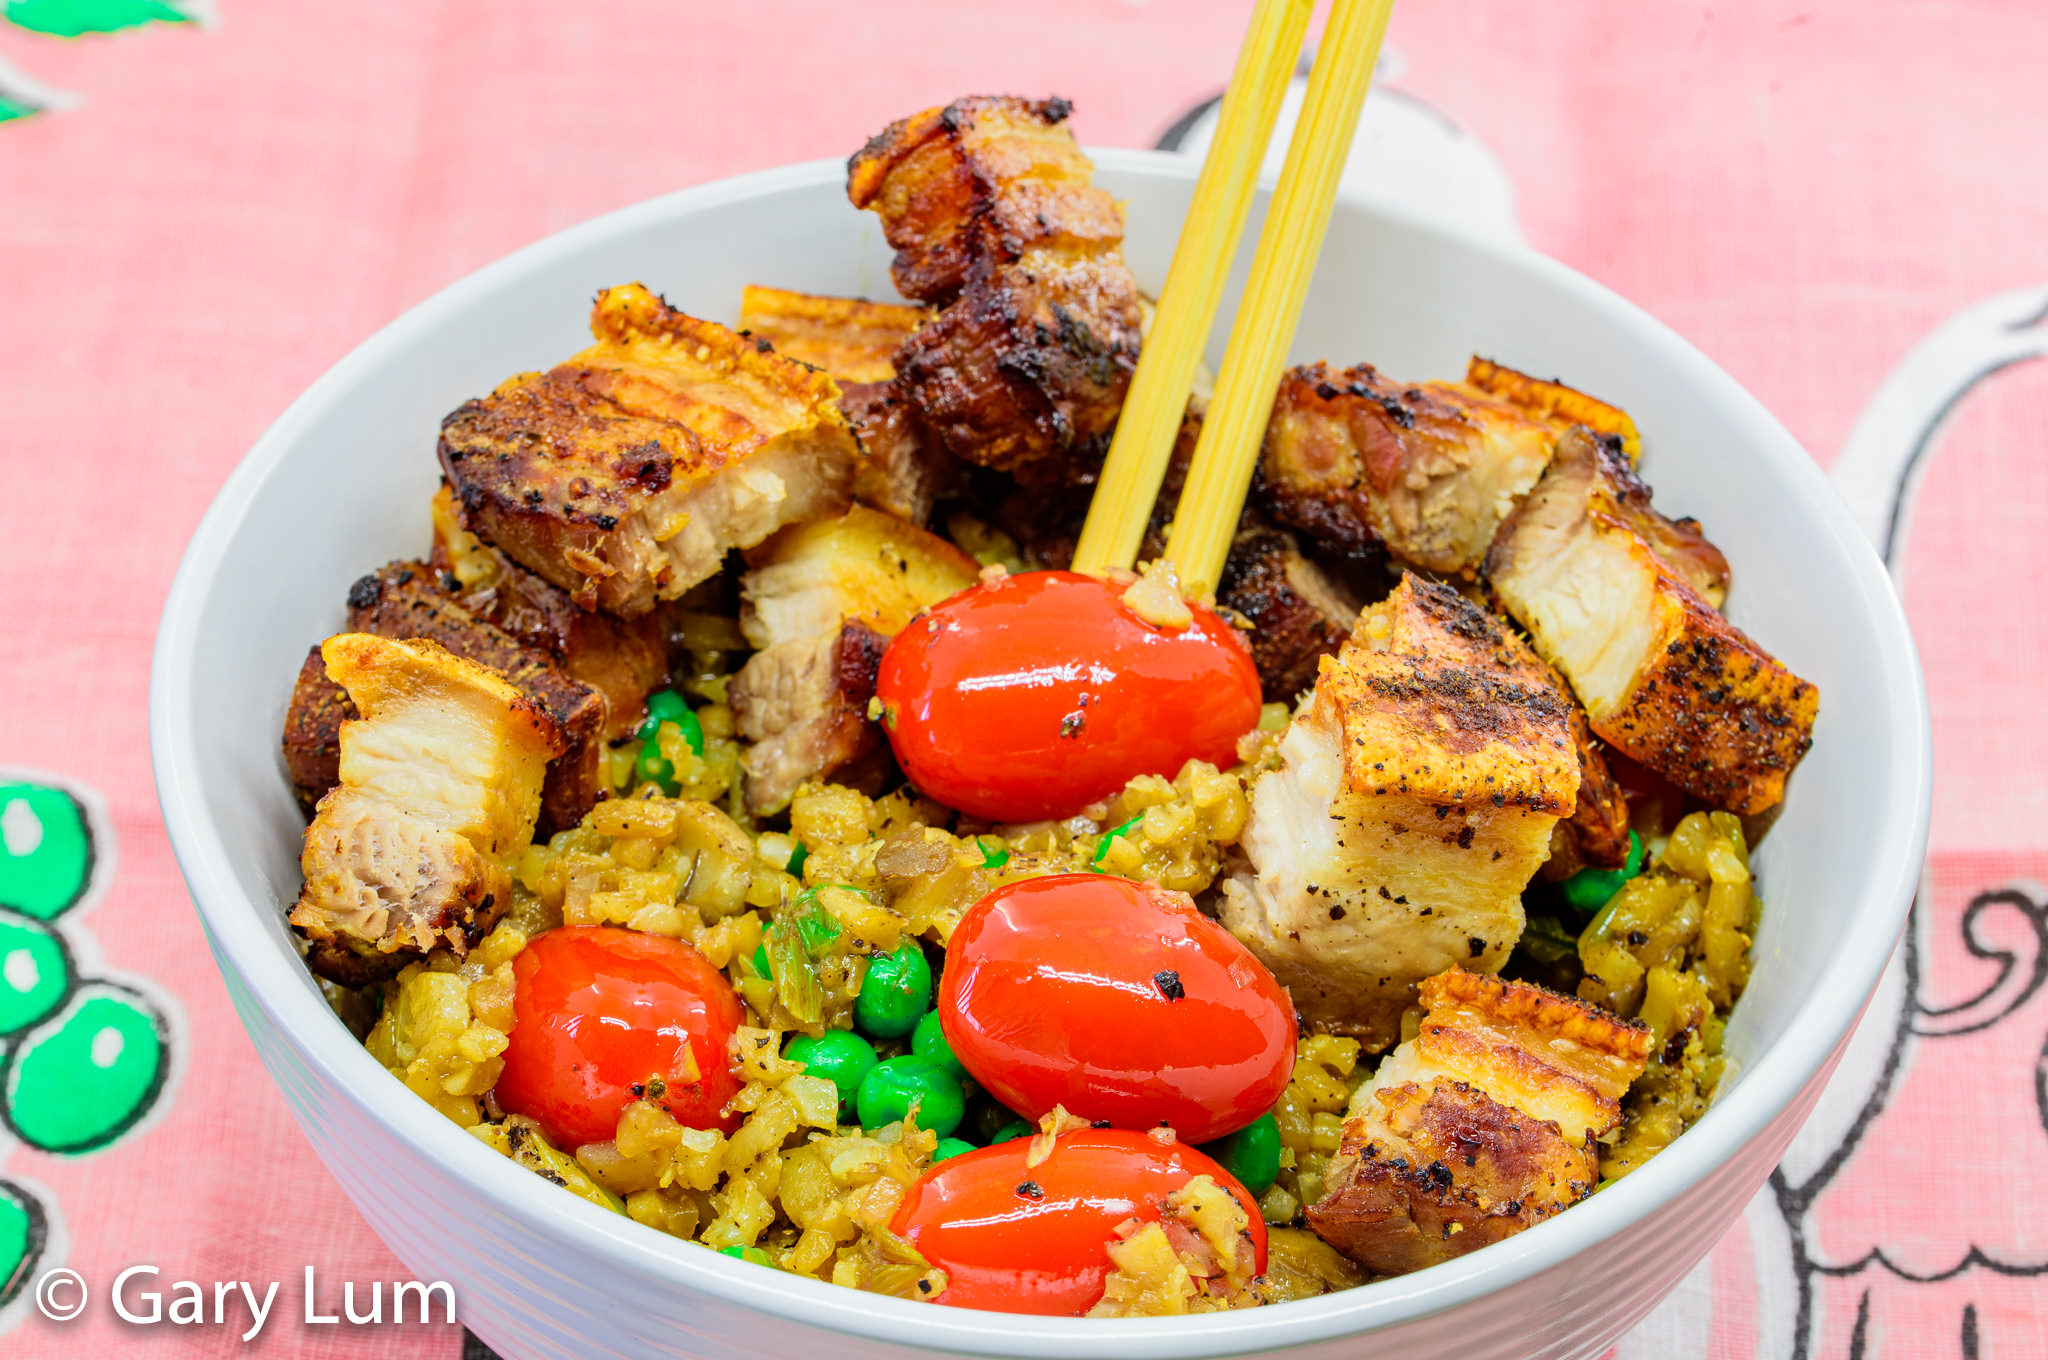 Close up. Leftover fried cauliflower rice with pork belly. Gary Lum.